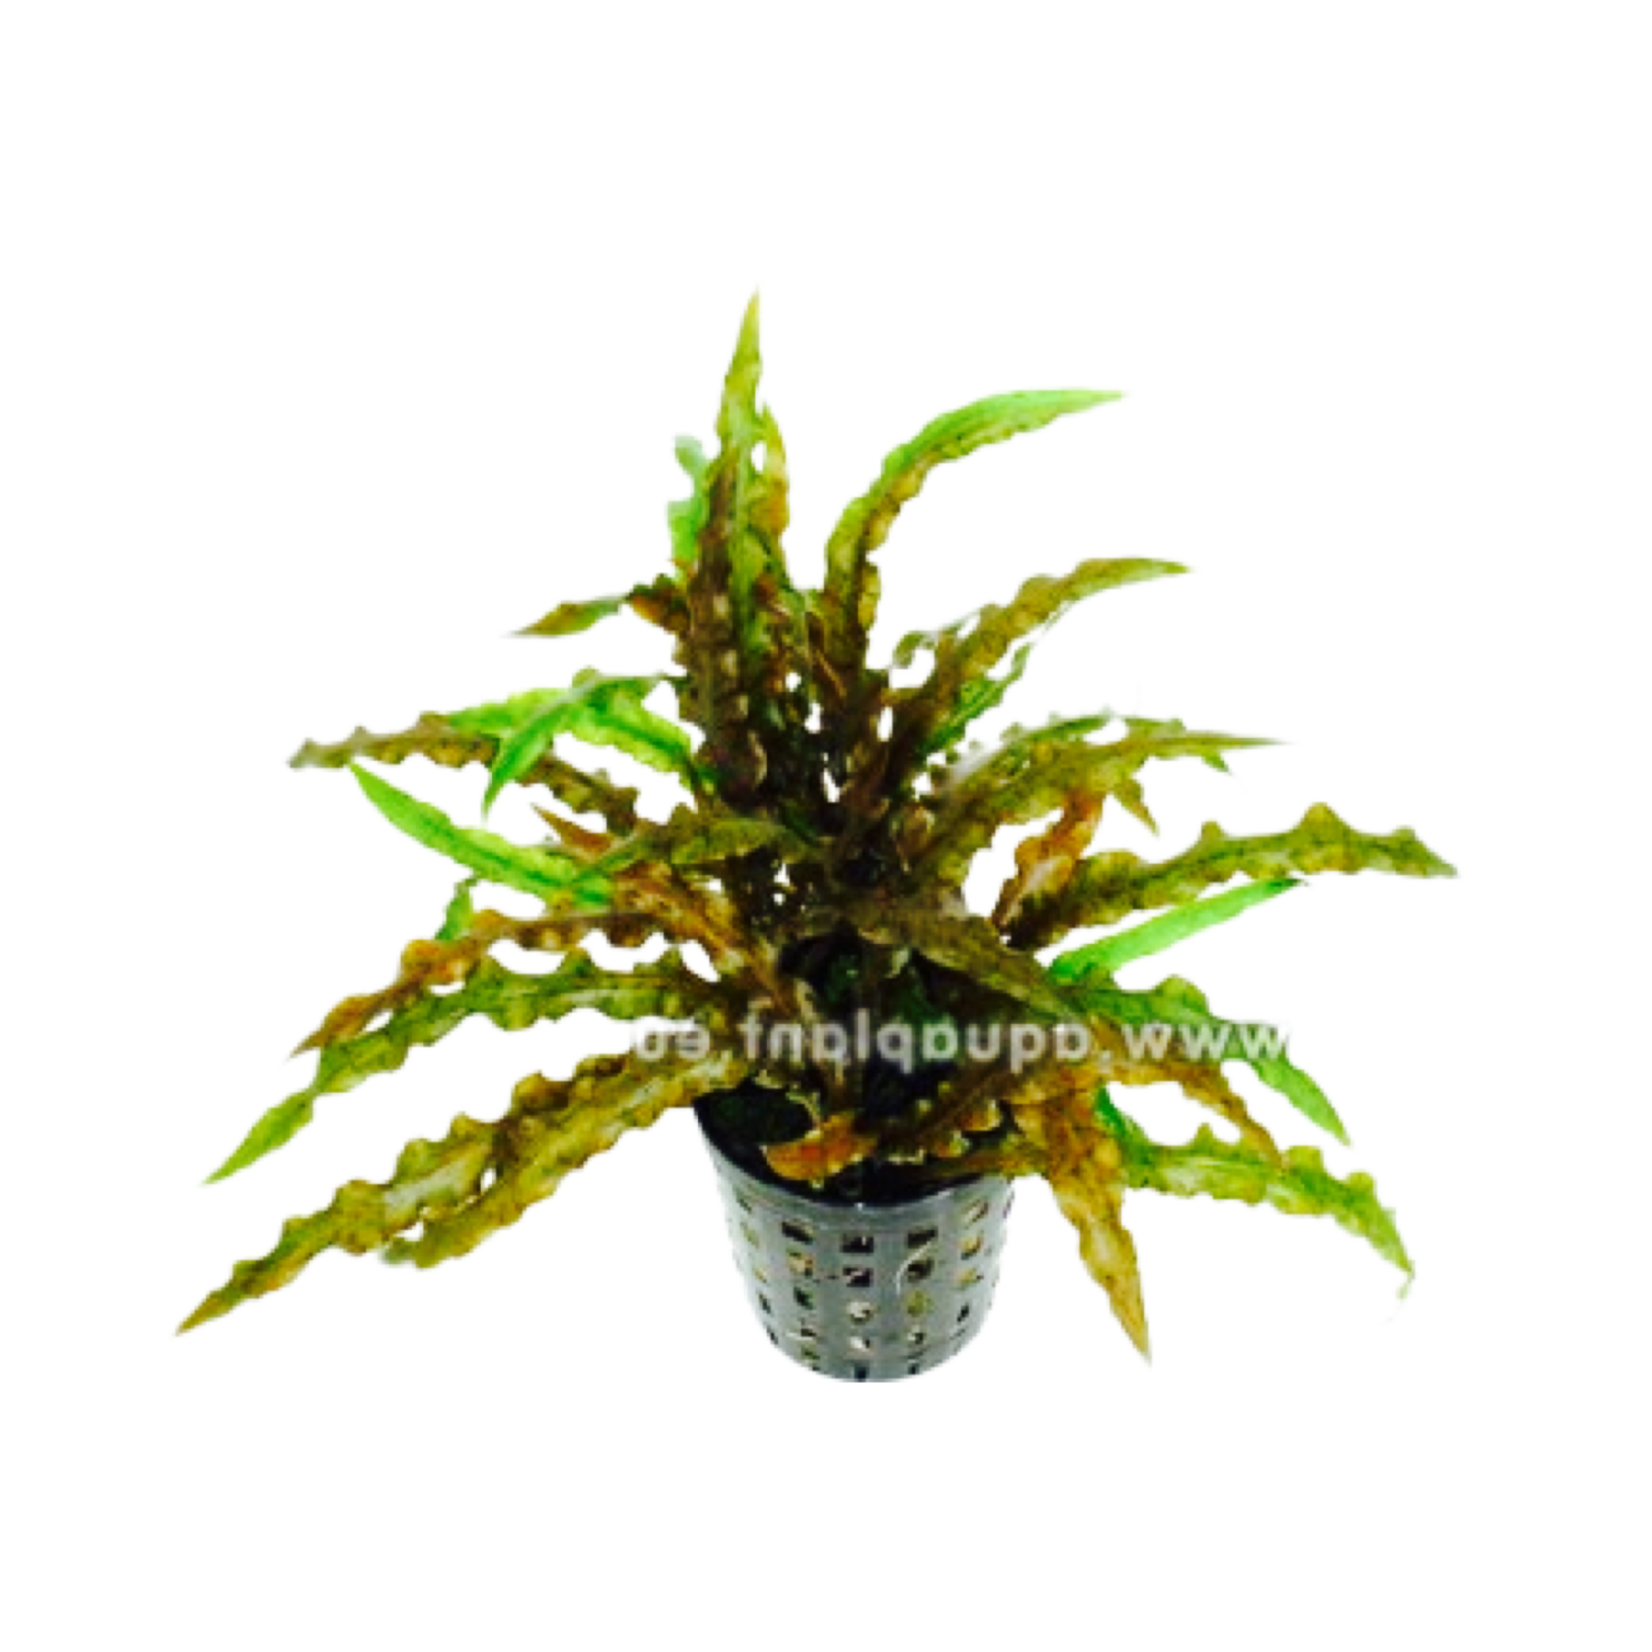 Bubba's Plants Cryptocoryne costata